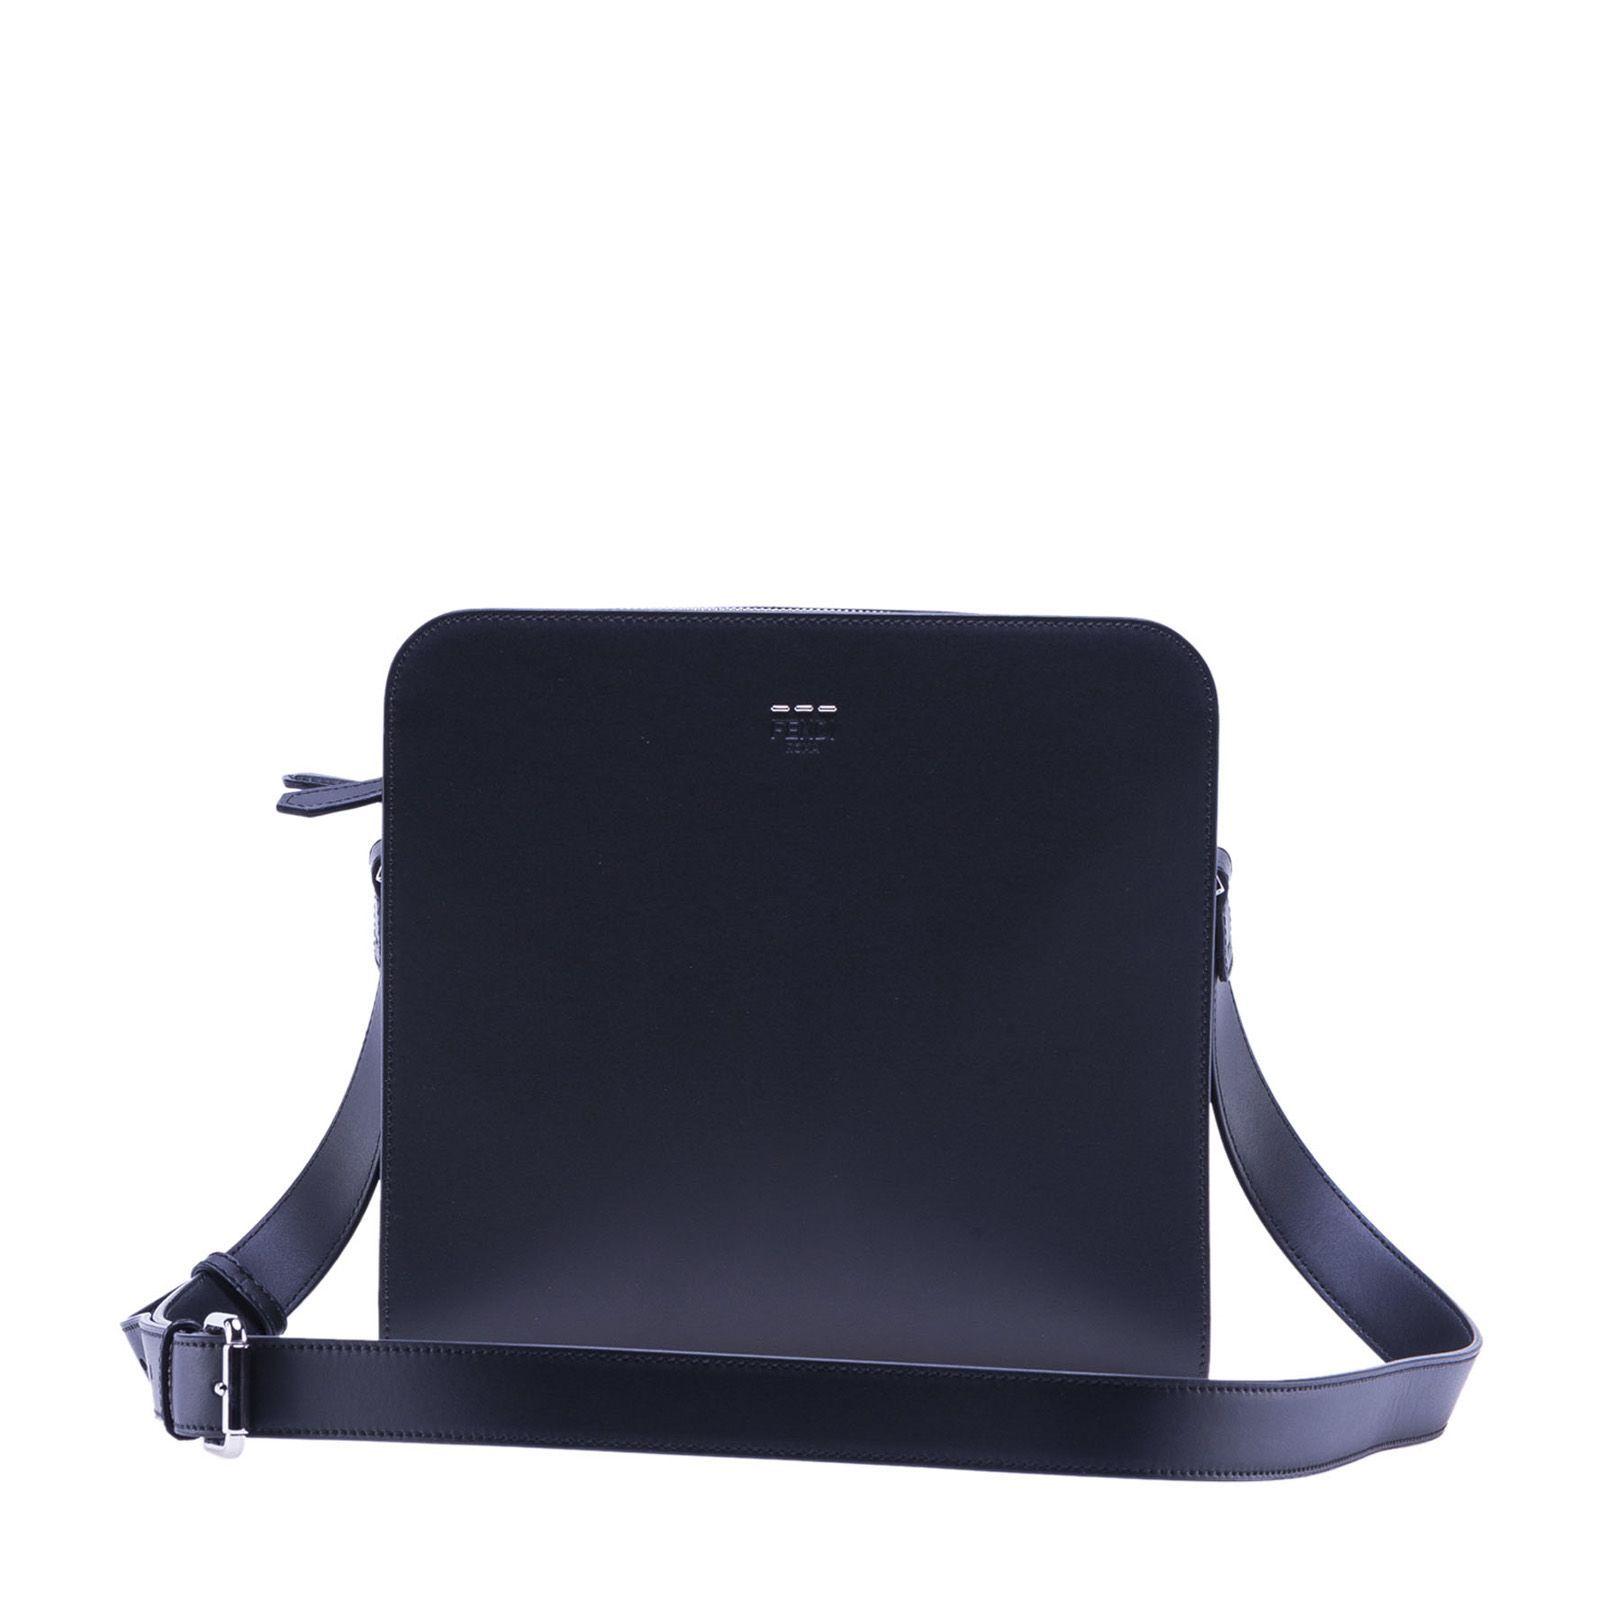 fdc2d1df72c7 FENDI FENDI CLASSIC MINI MESSENGER BAG.  fendi  bags  shoulder bags   leather